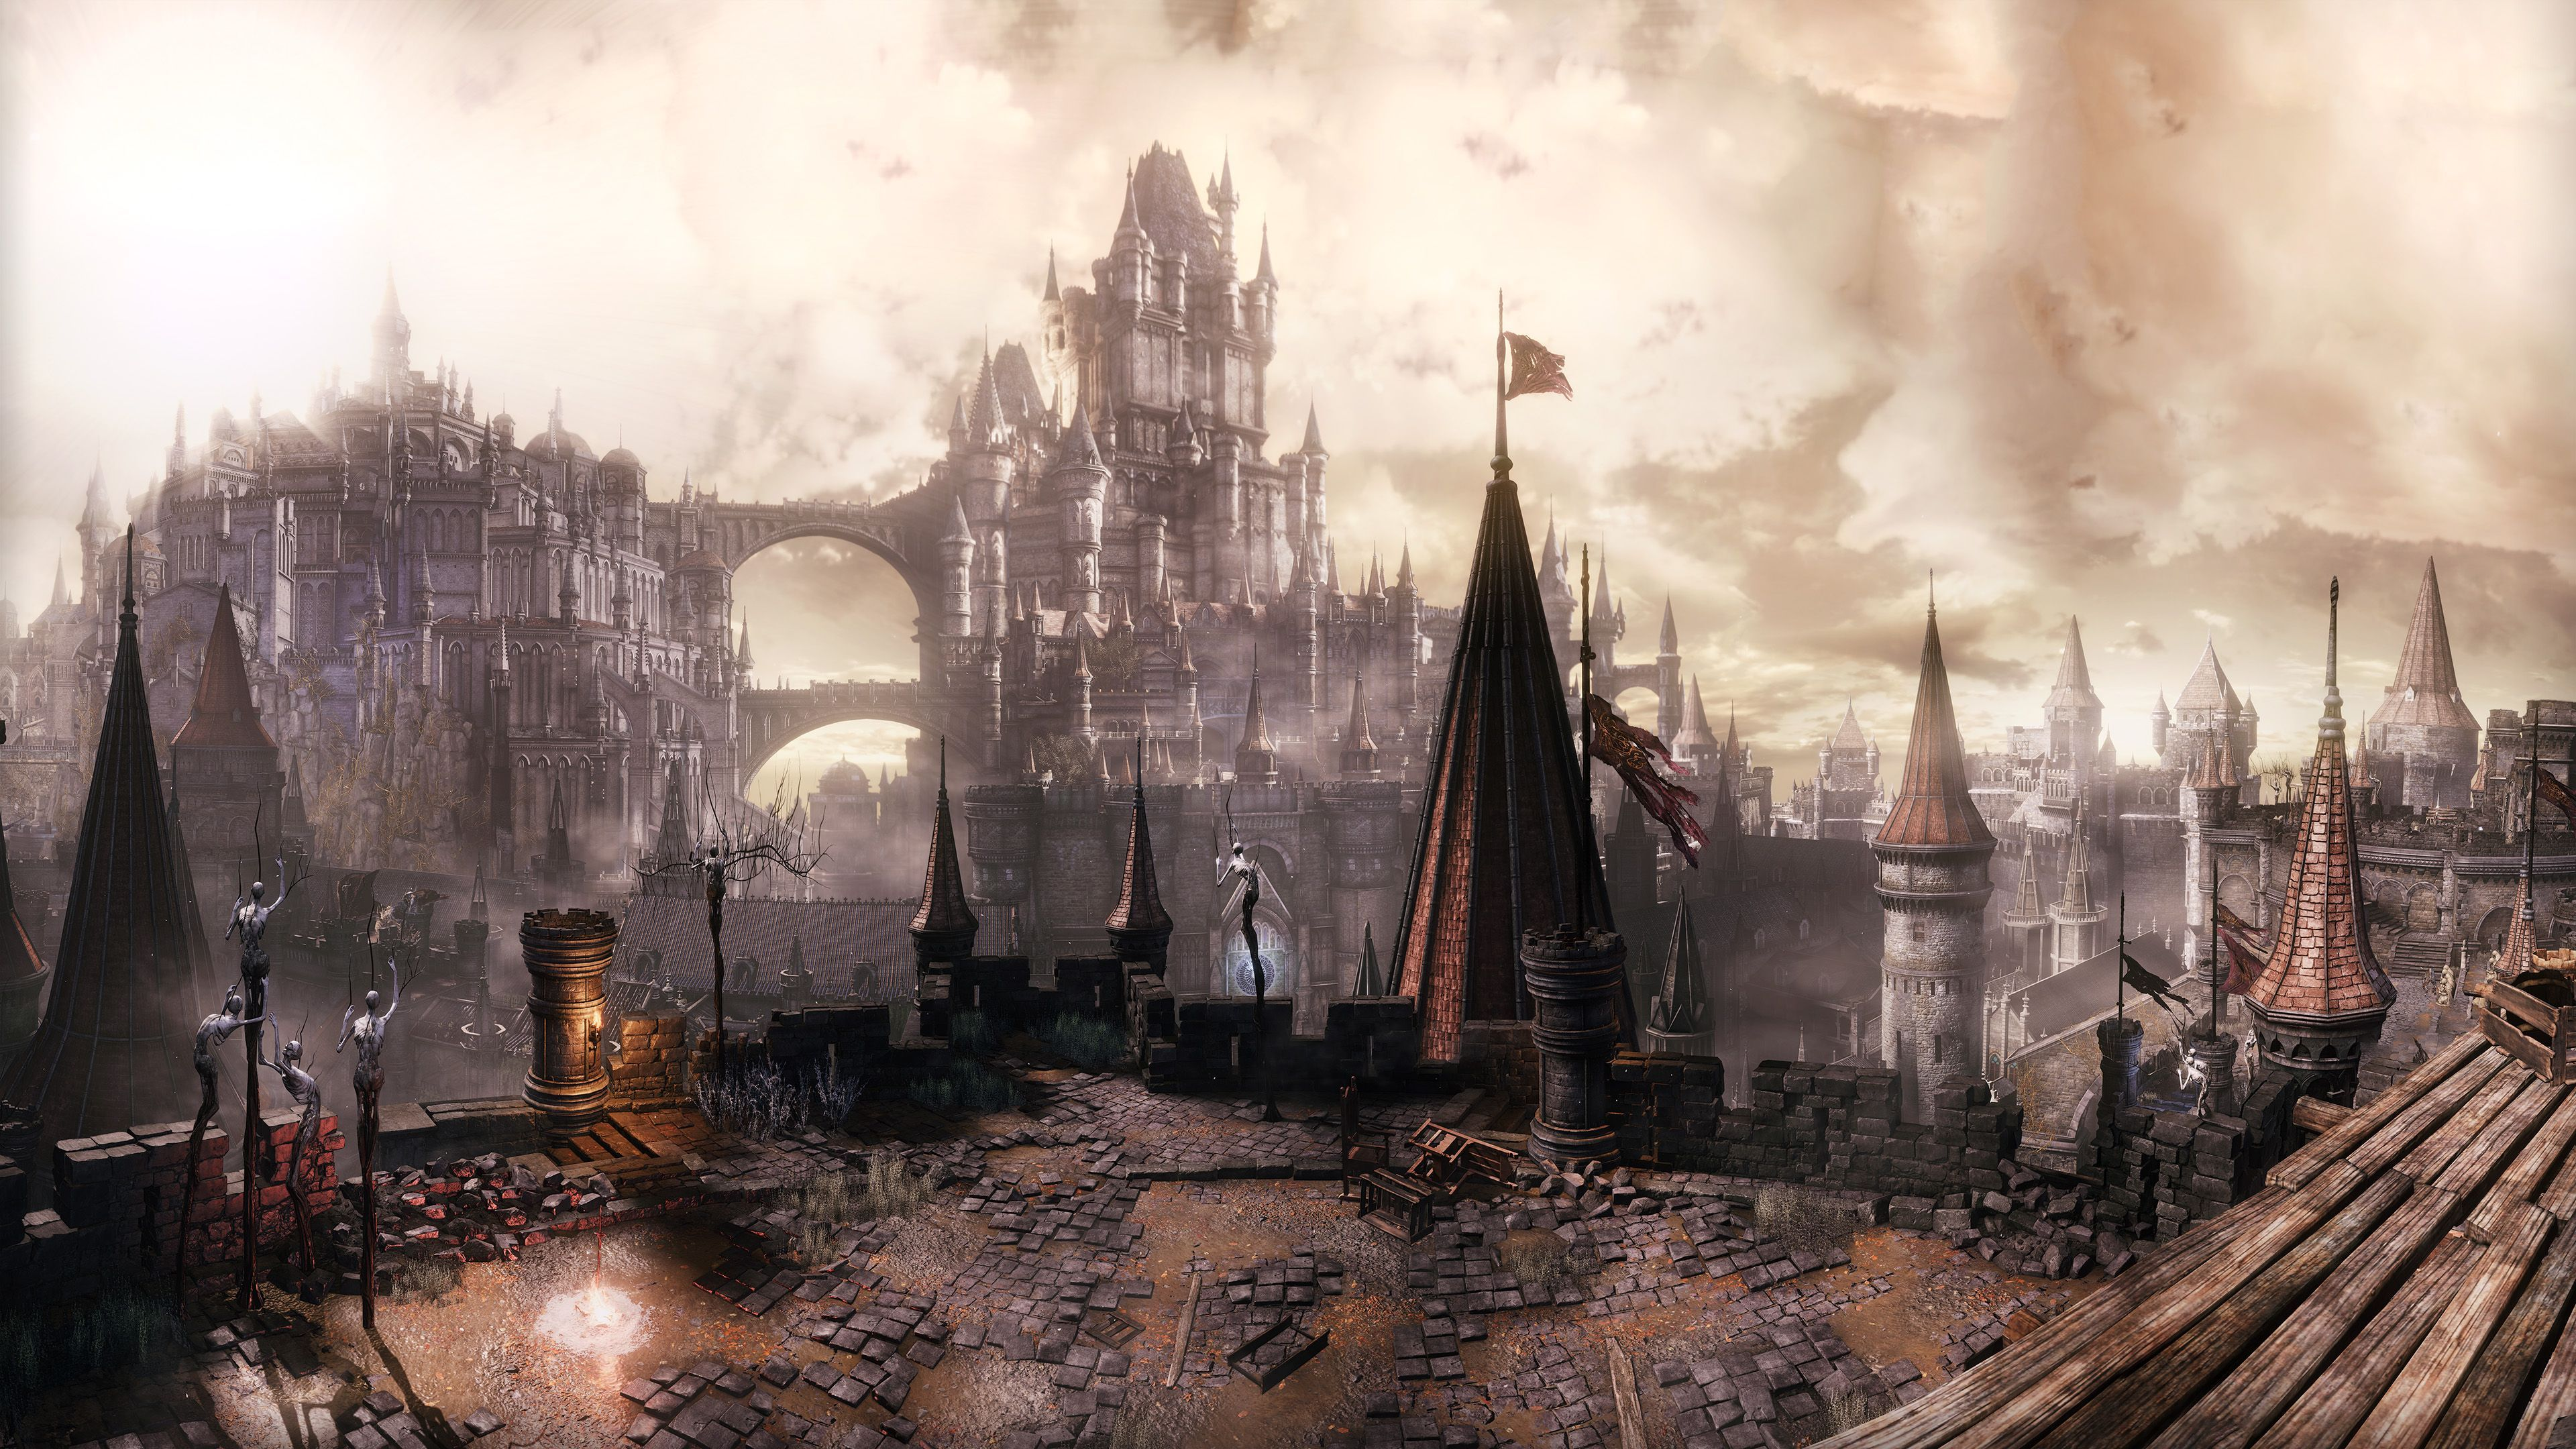 3840x2160 Dark Souls Iii 4k Wallpaper High Resolution Part 4 Album On Dark Souls Wallpaper Dark Souls Dark Souls Locations